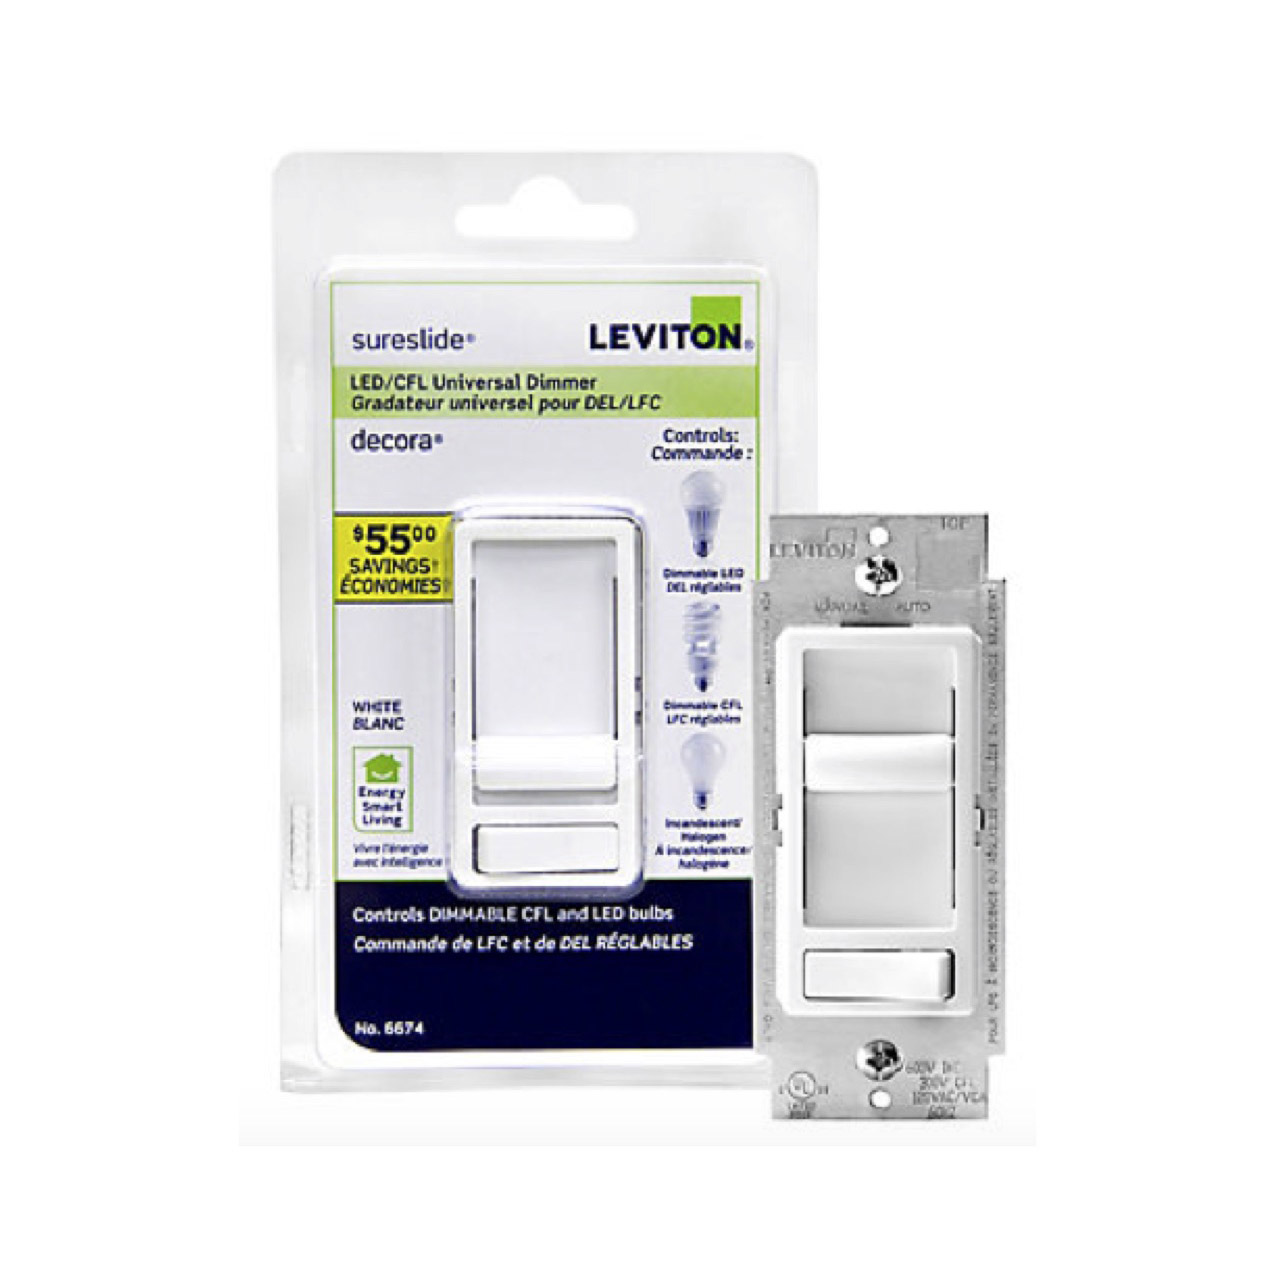 Leviton Sureslide